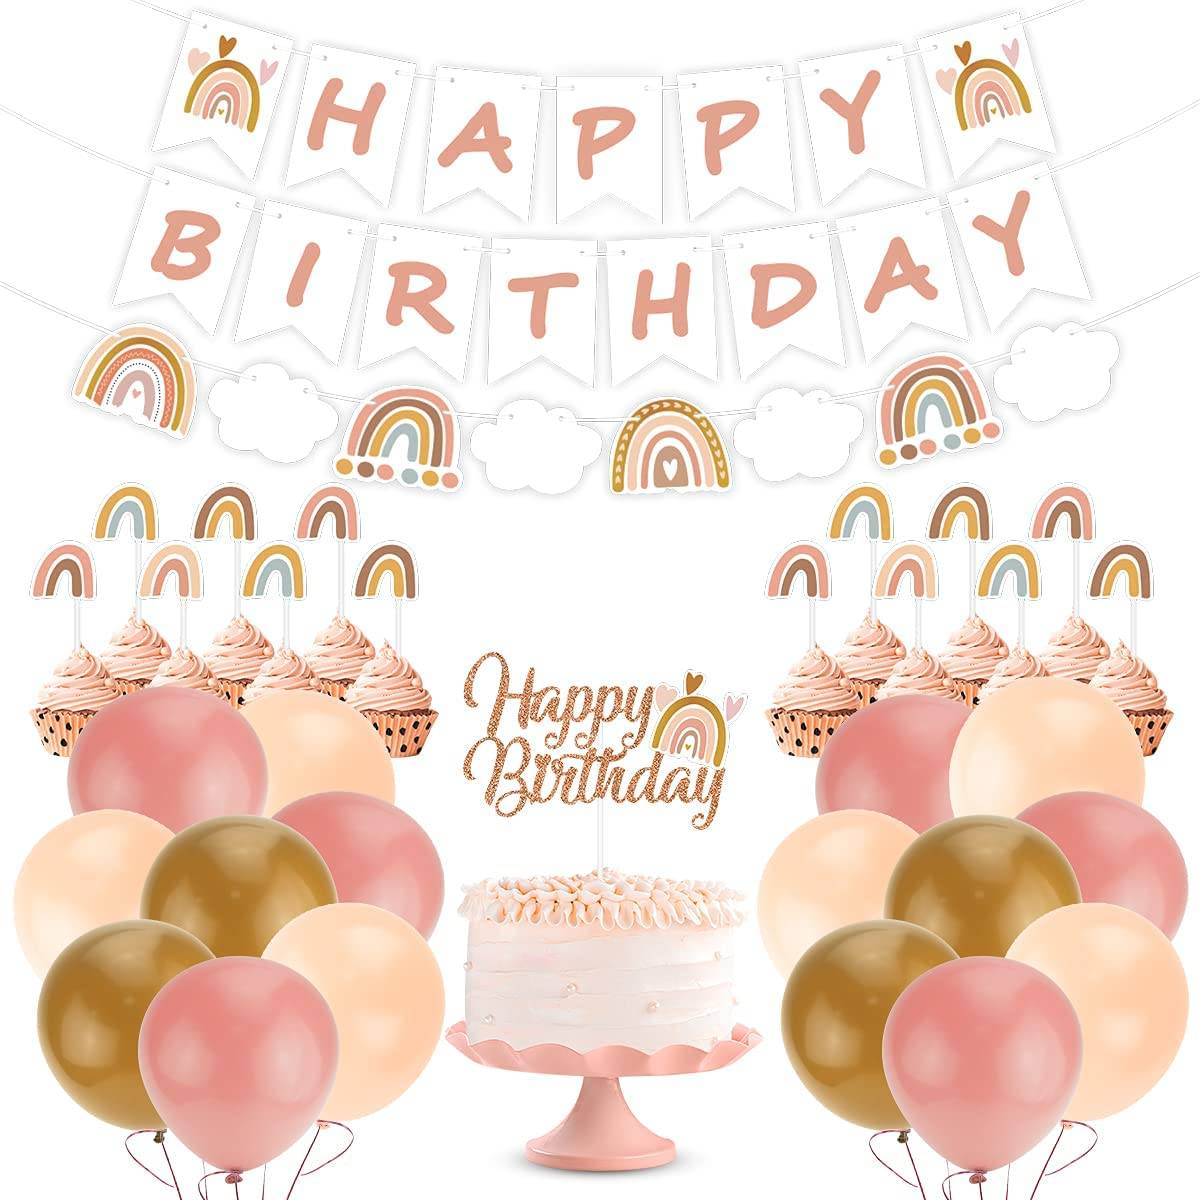 Boho Rainbow Birthday Party Decorations, Bohemian Rainbow Theme Happy Birthday Banner, Cake Toppers, Boho Rainbow Balloon Garland for Boho Rainbow Neutral Baby Shower Birthday Party Supplies